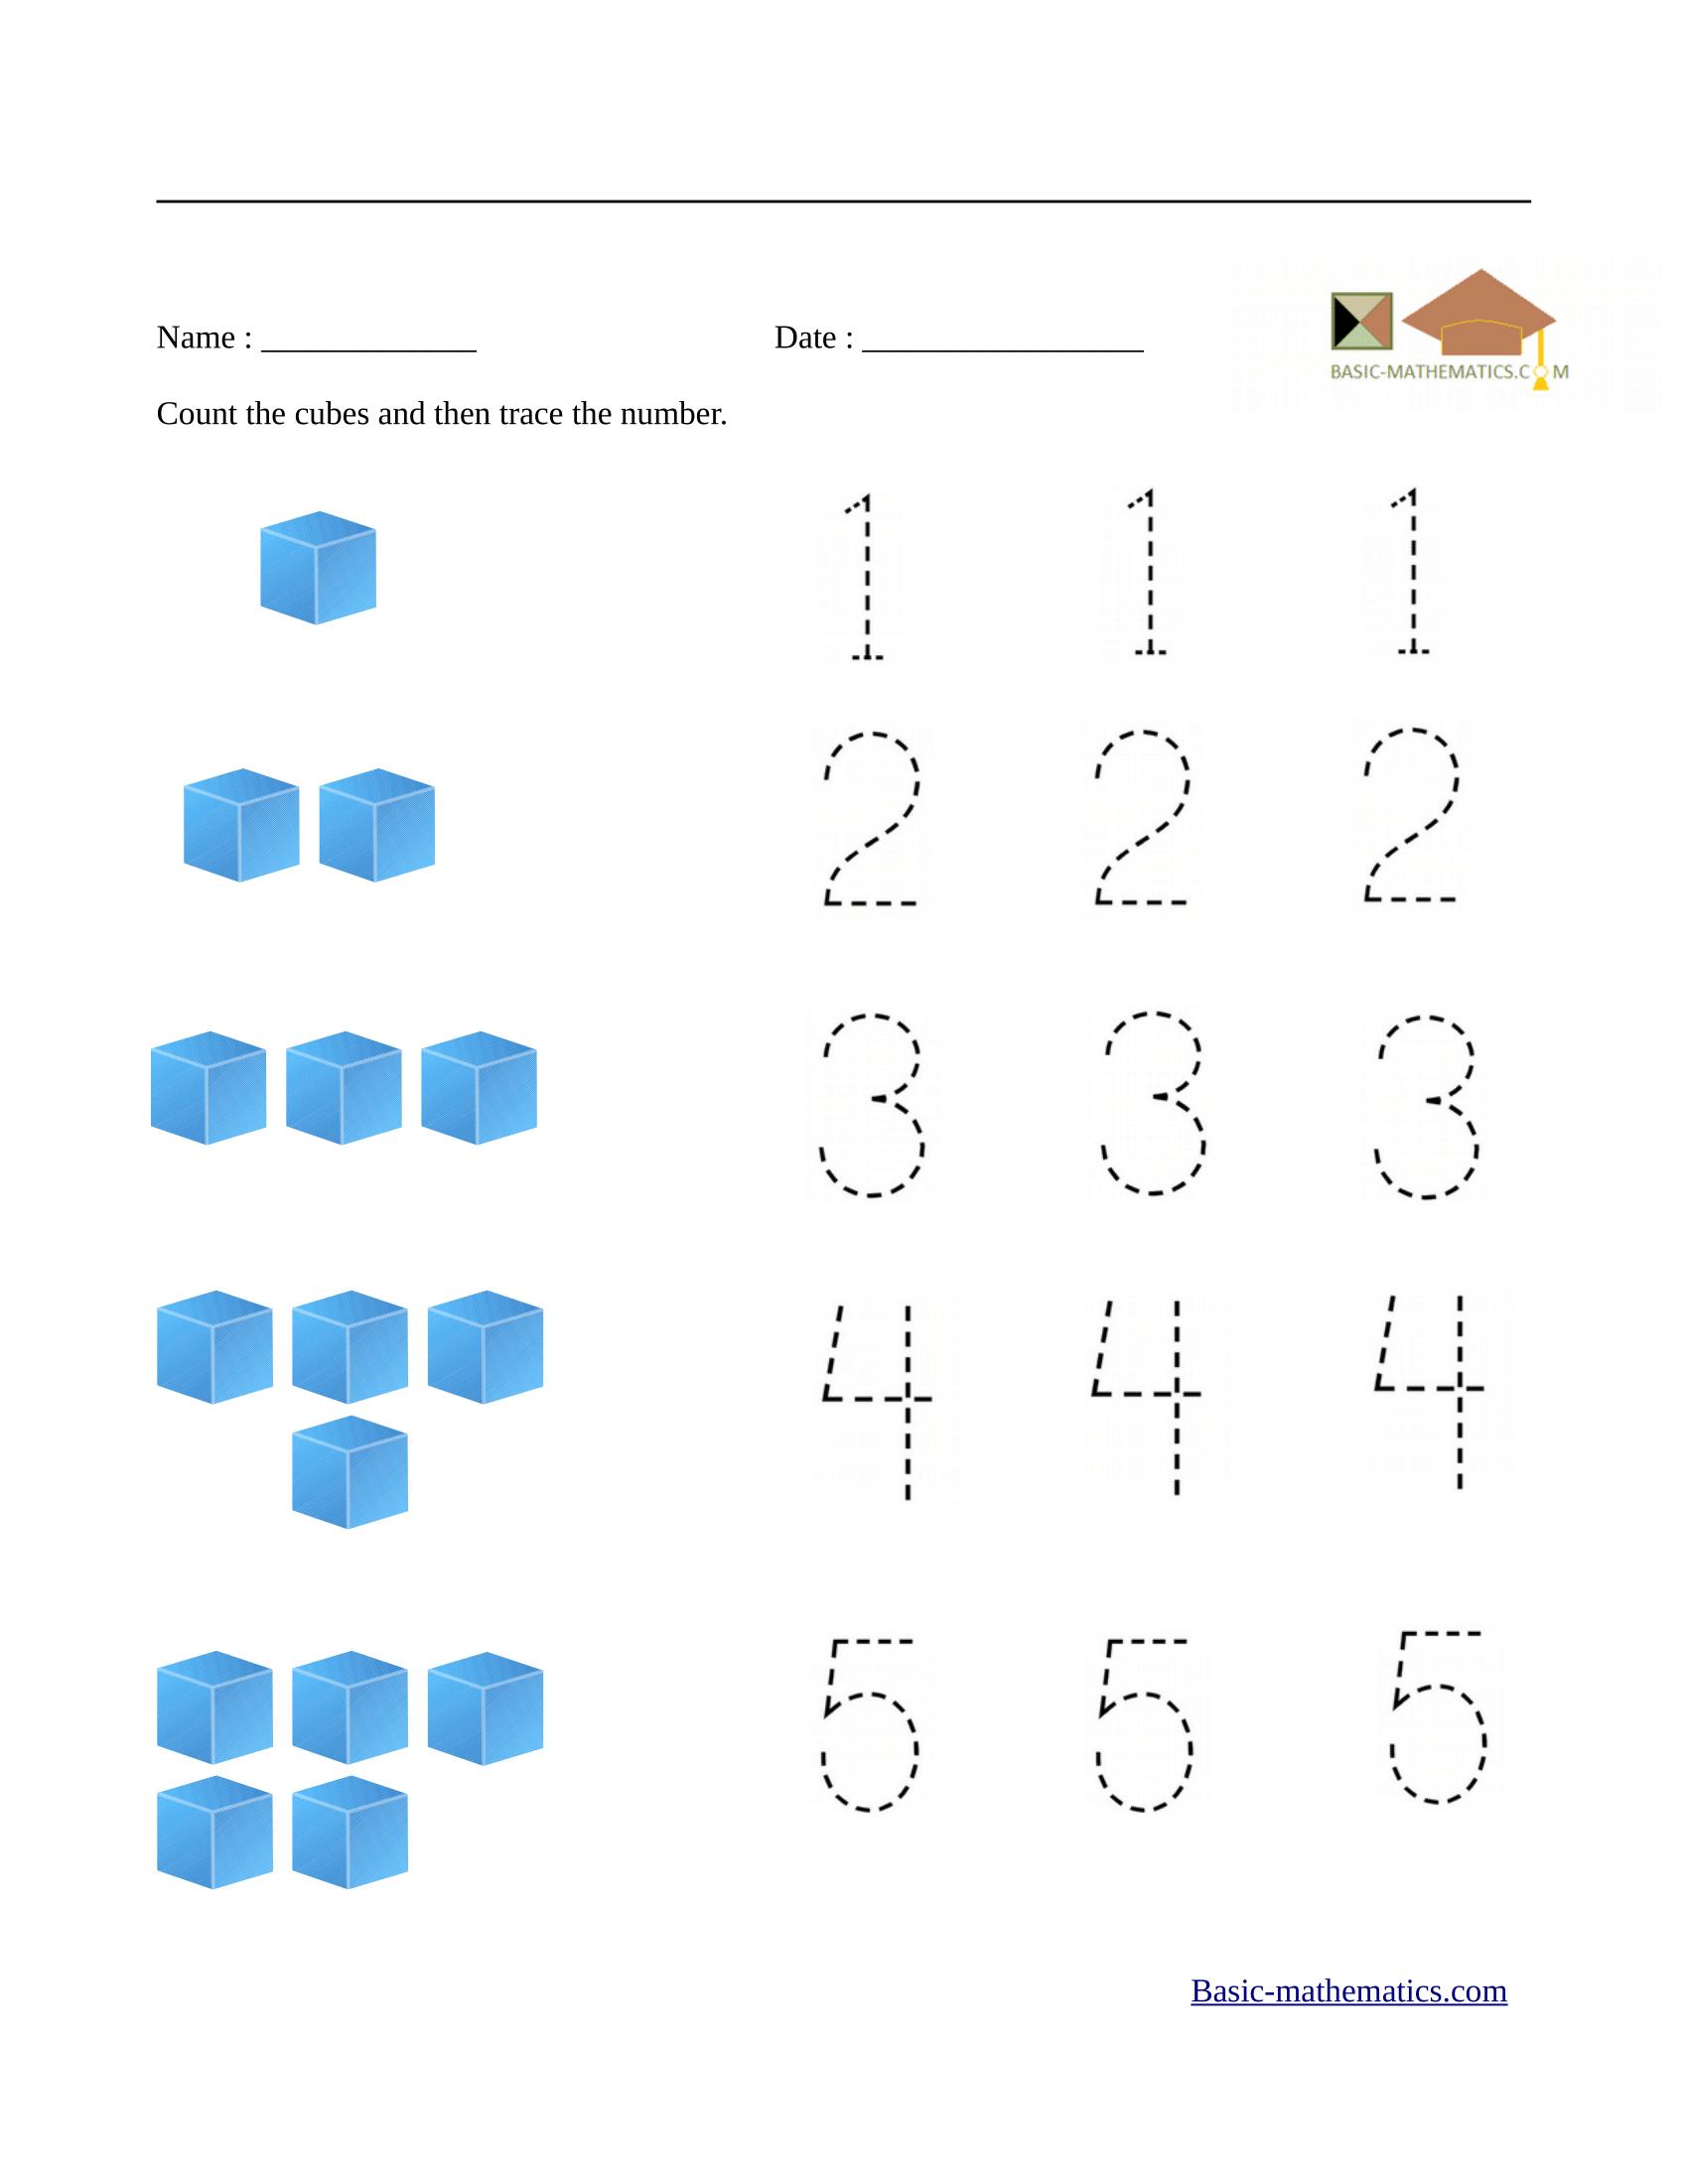 Preschool Math Worksheets - Free Printable Math Worksheets For Kids